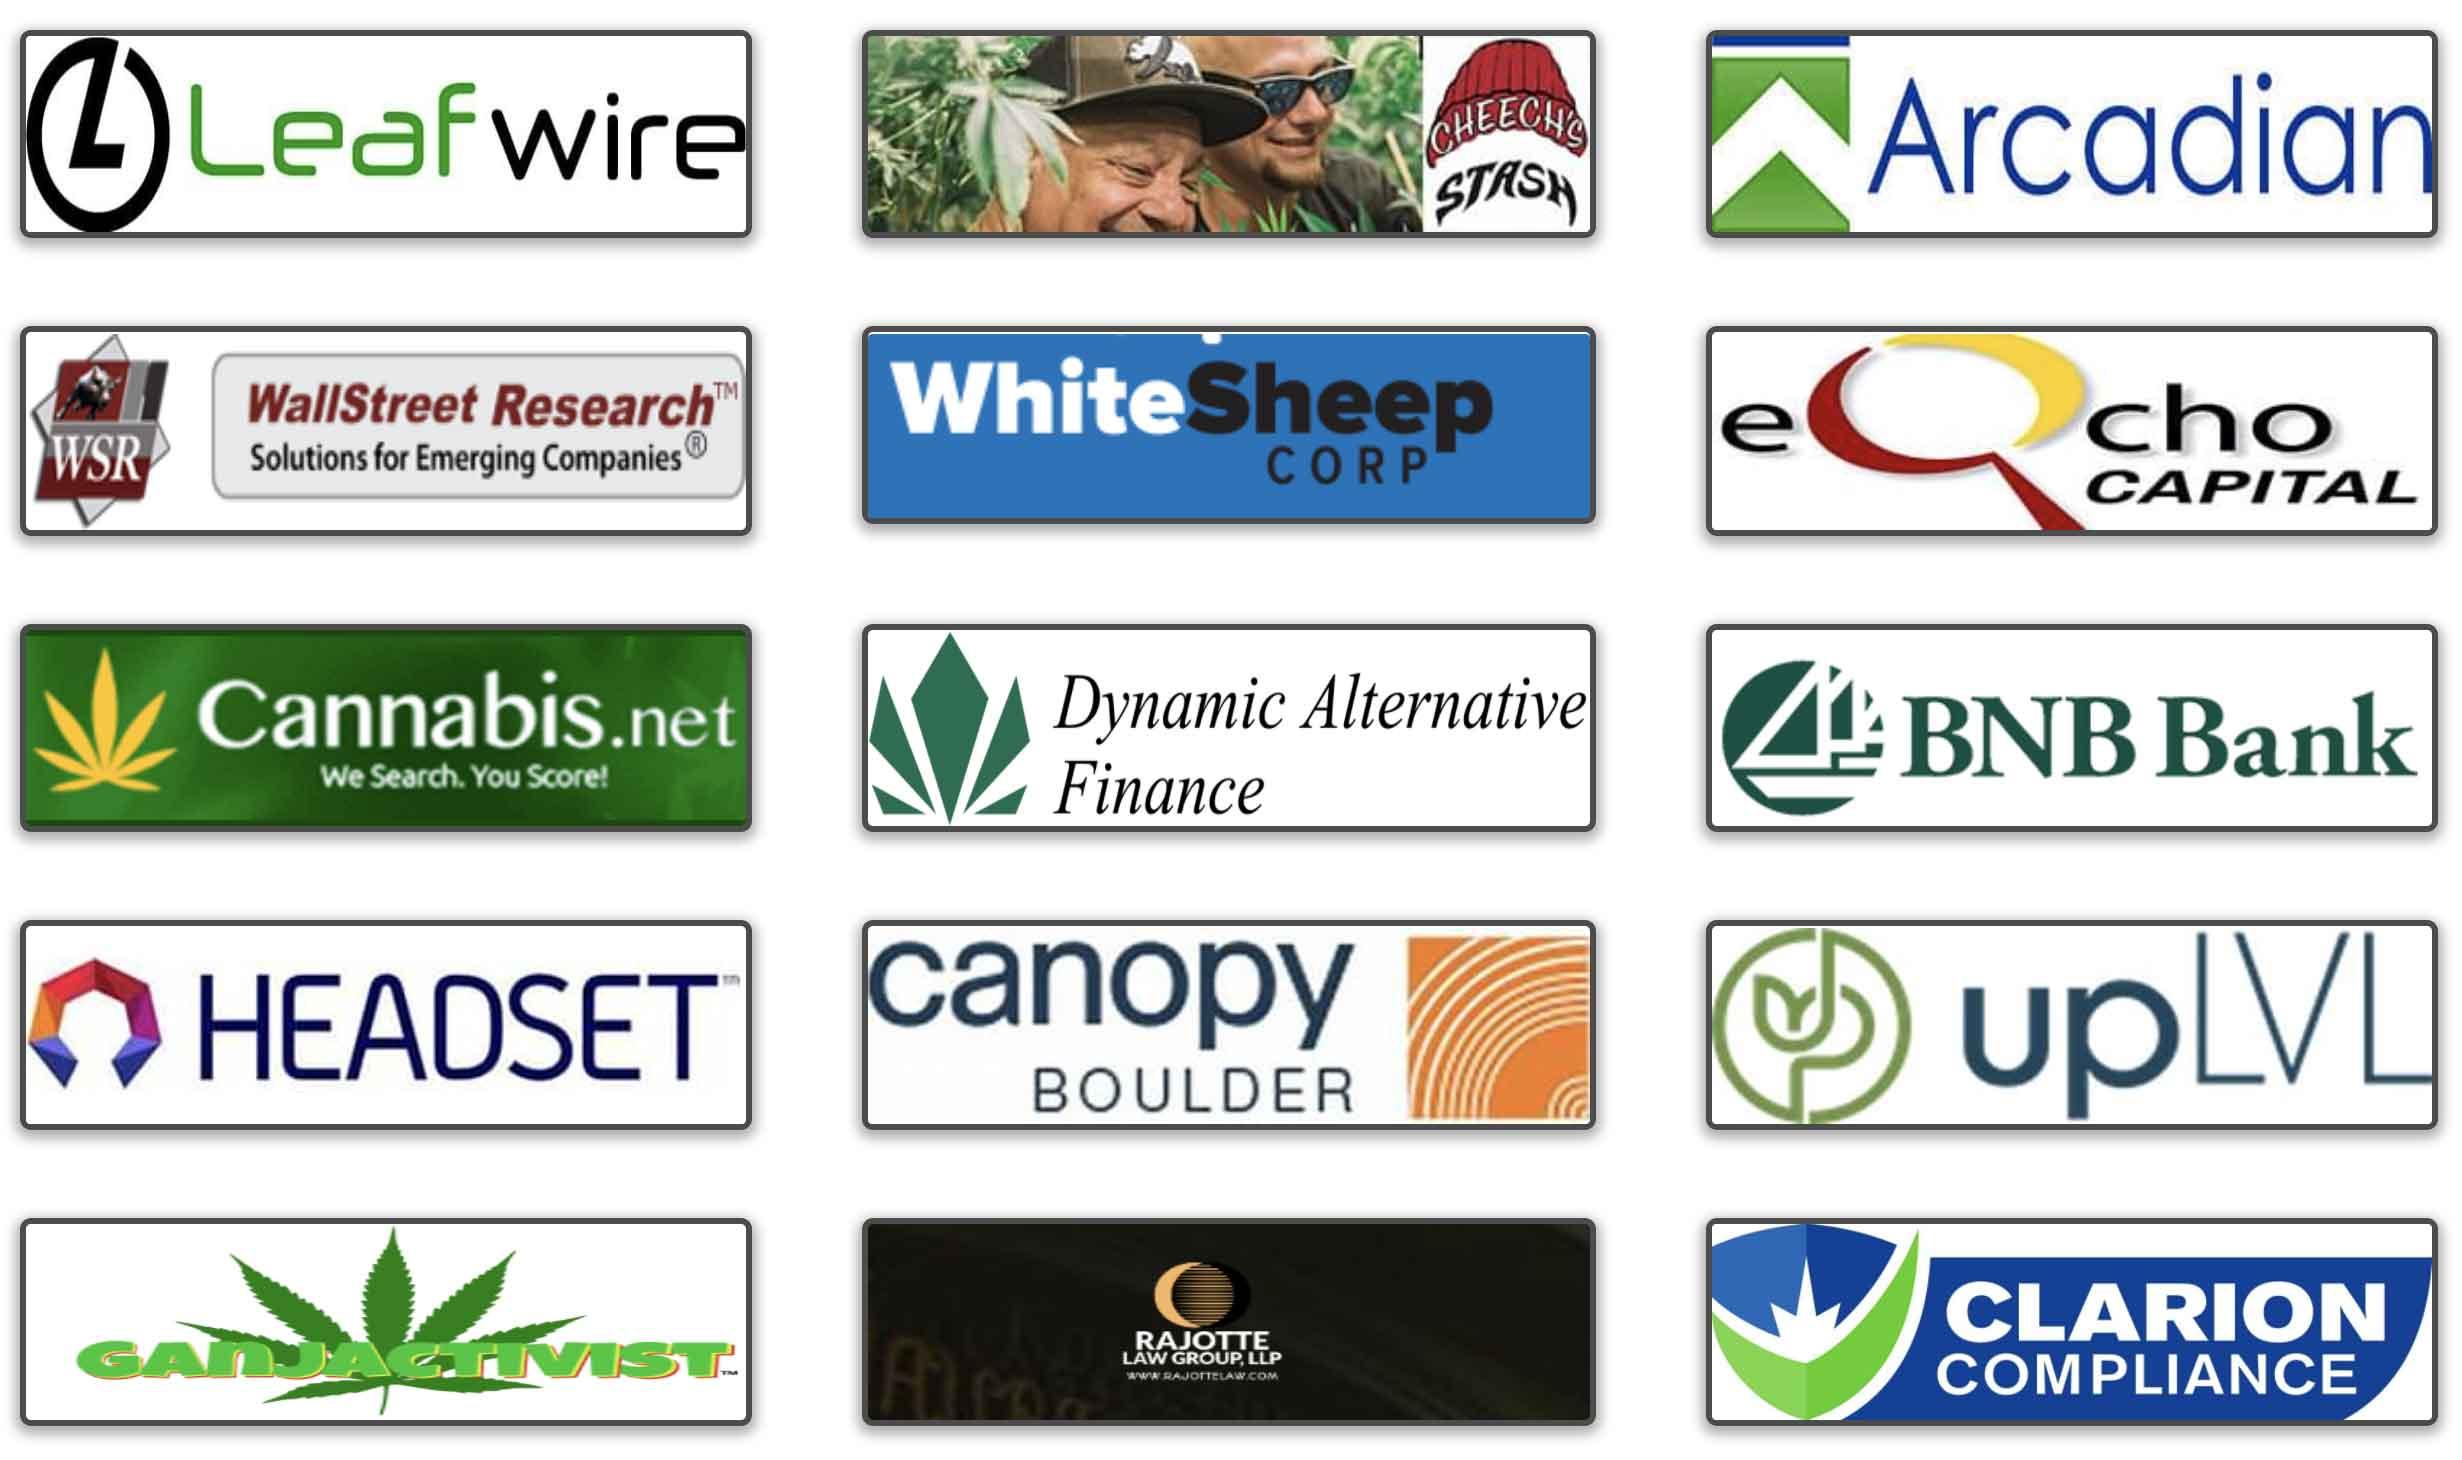 Cannabis10x event sponsors